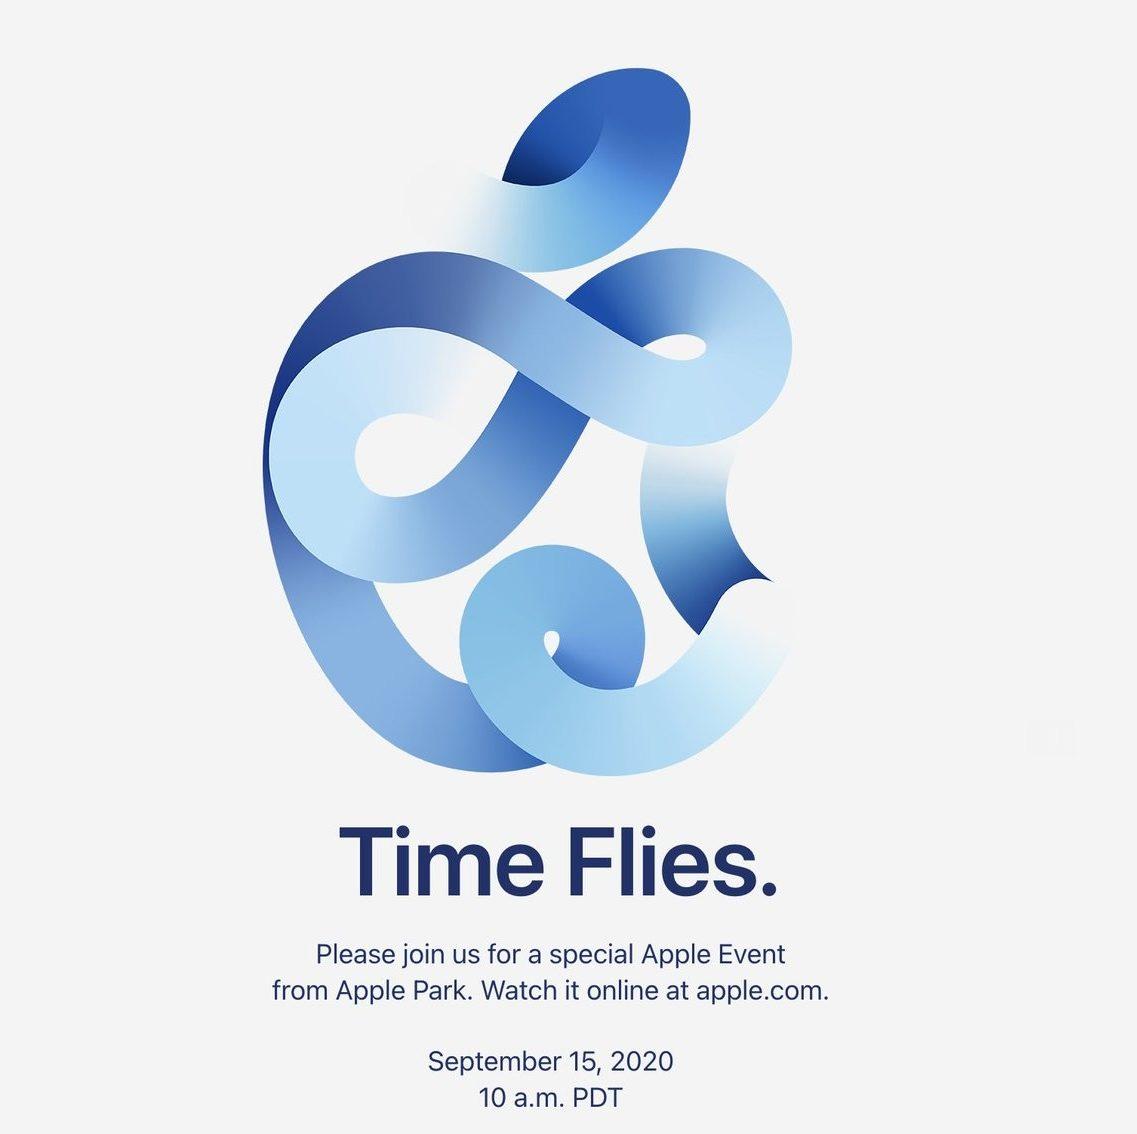 Apple-Event-Time-Flies-e1599634974241